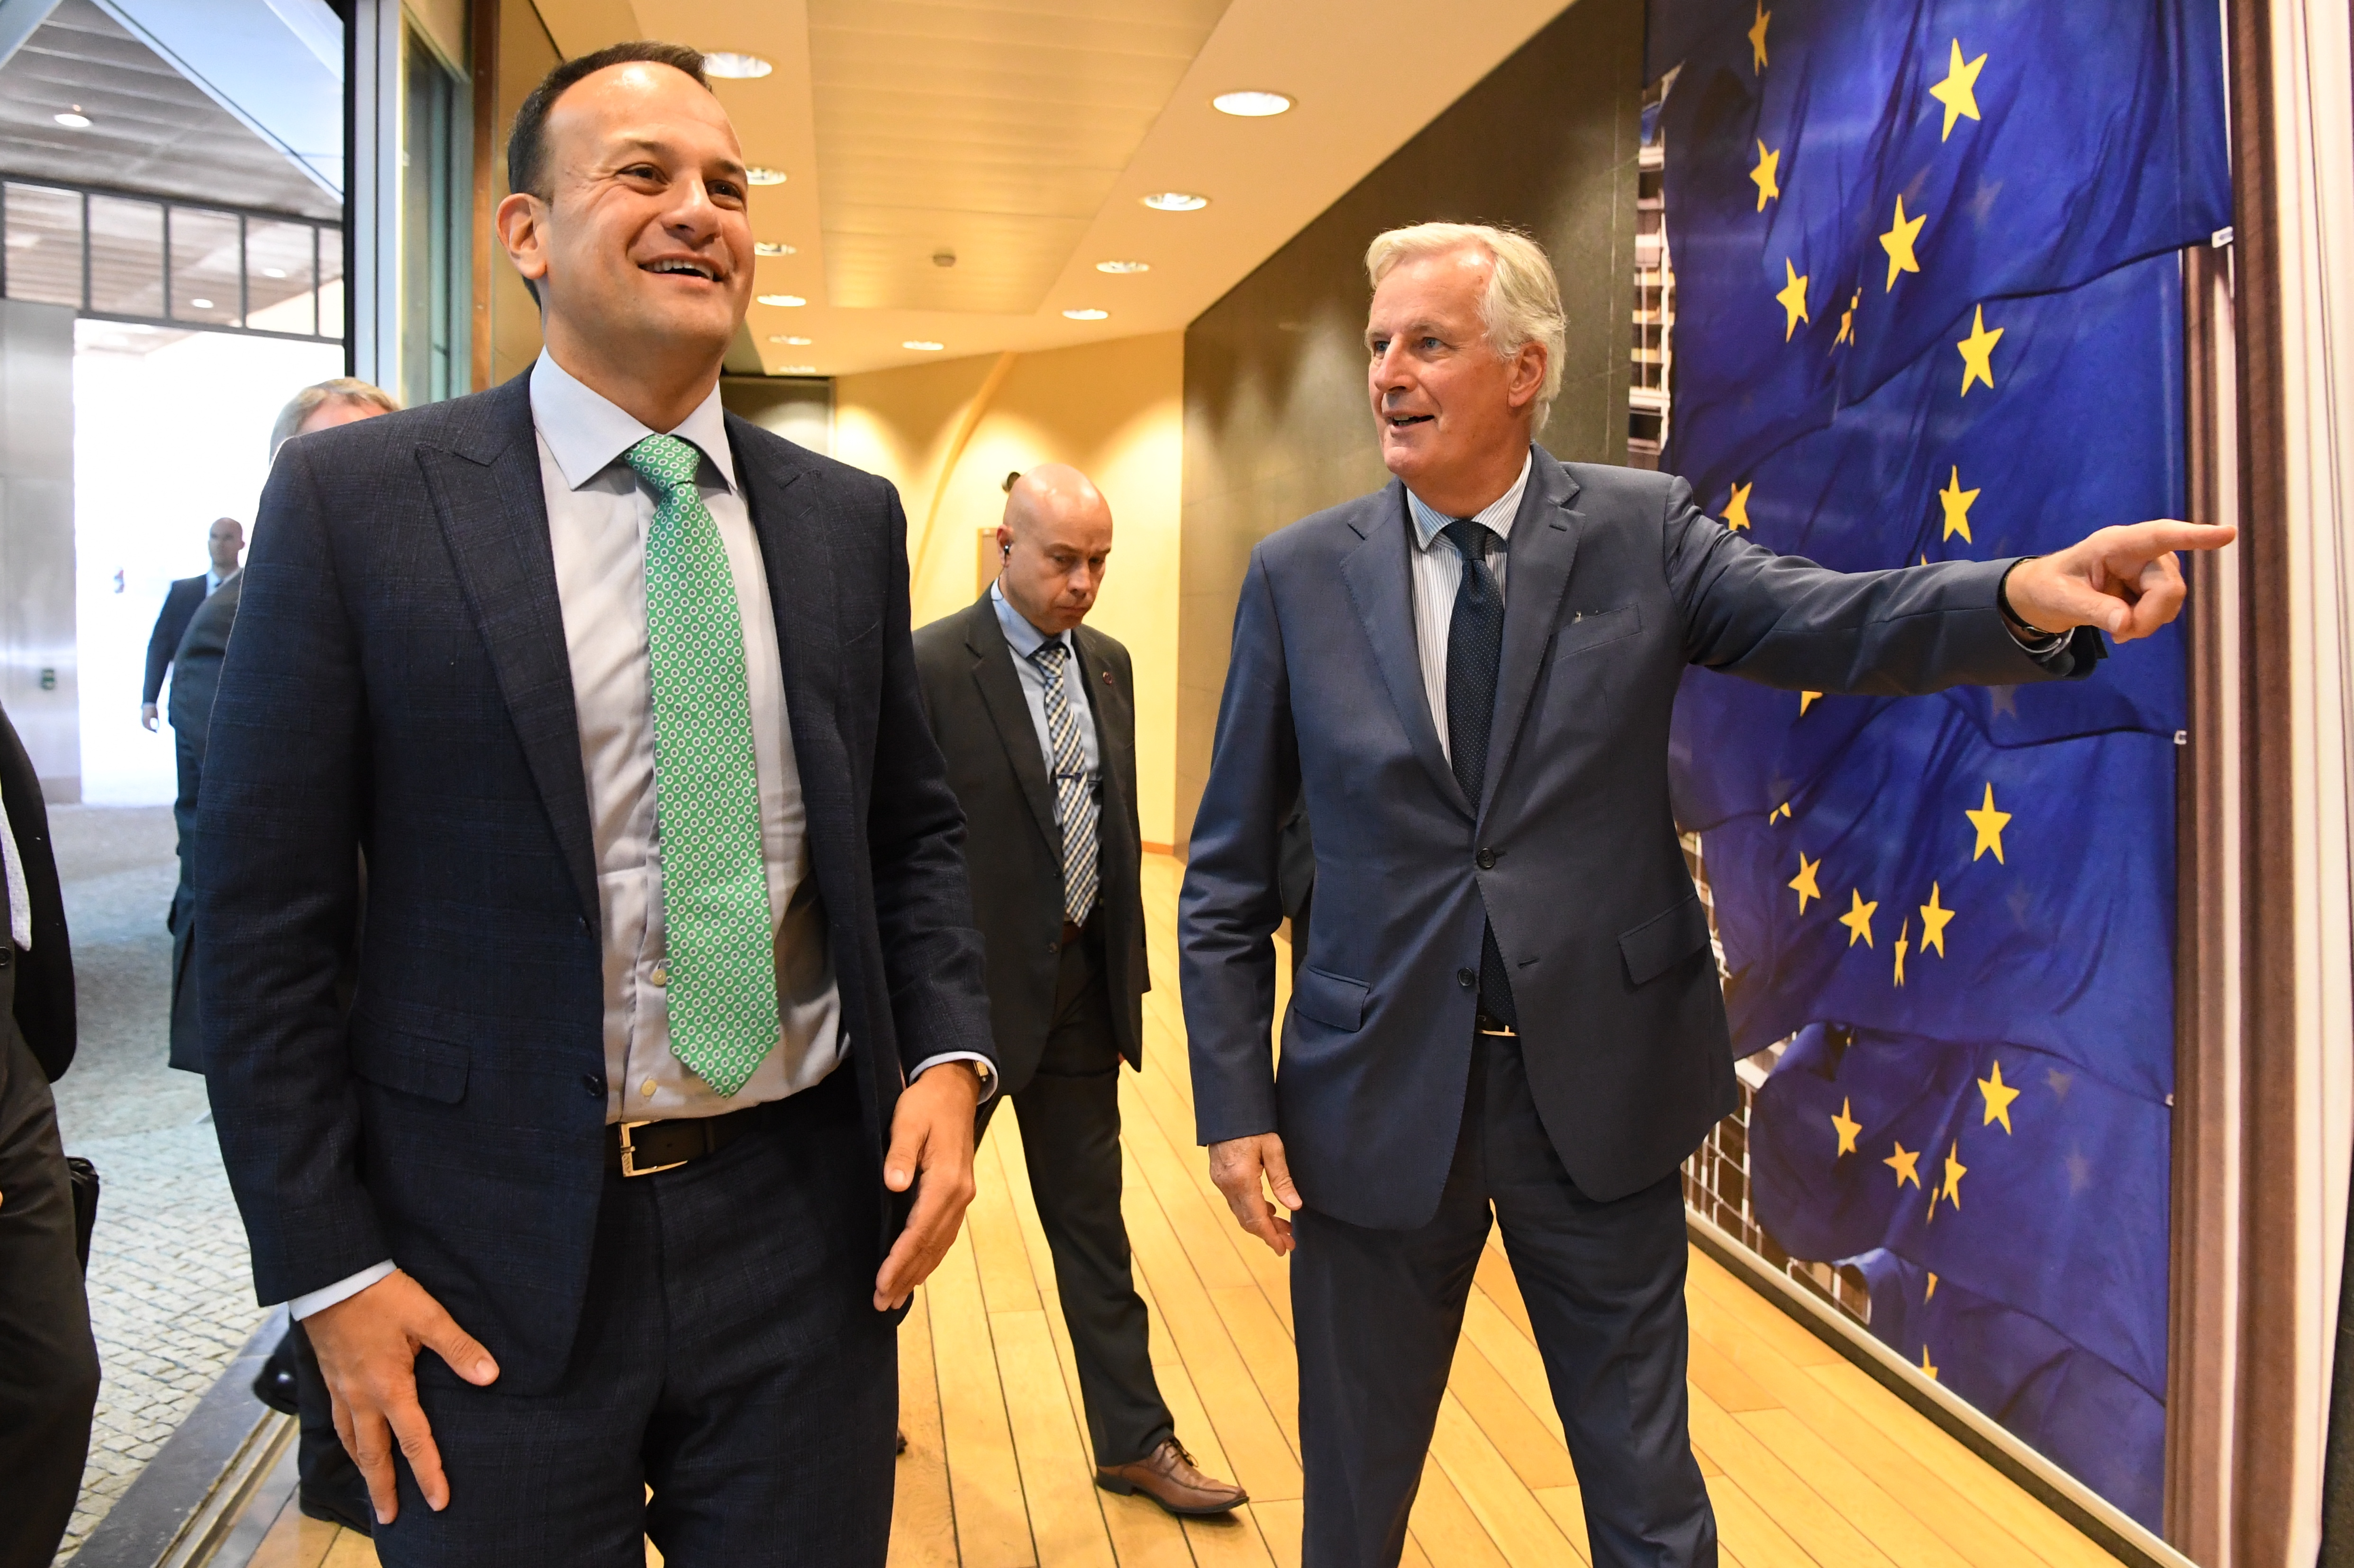 'Brexit is not going to go away,' warns EU's Barnier